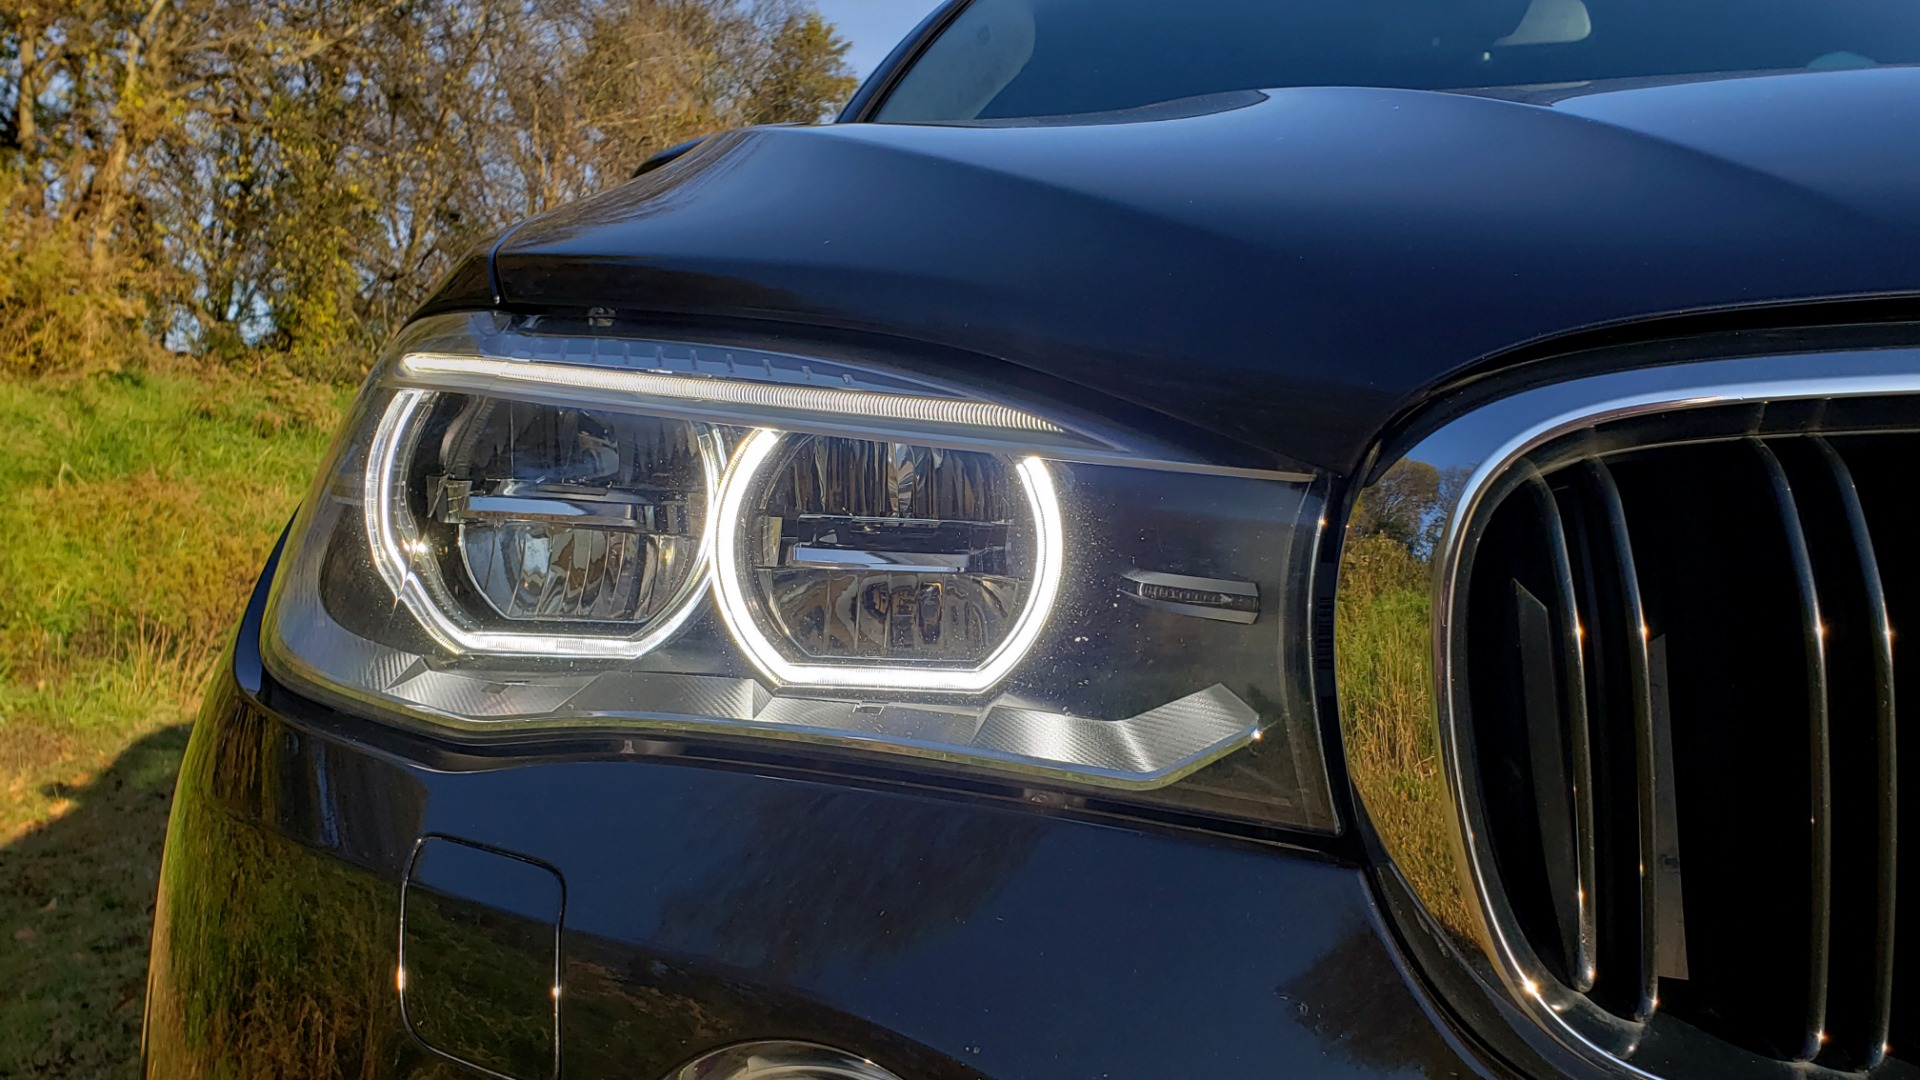 Used 2016 BMW X6 M EXEC PKG / DRVR ASST / NAV / SUNROOF / BLIND SPOT / REARVIEW for sale Sold at Formula Imports in Charlotte NC 28227 13